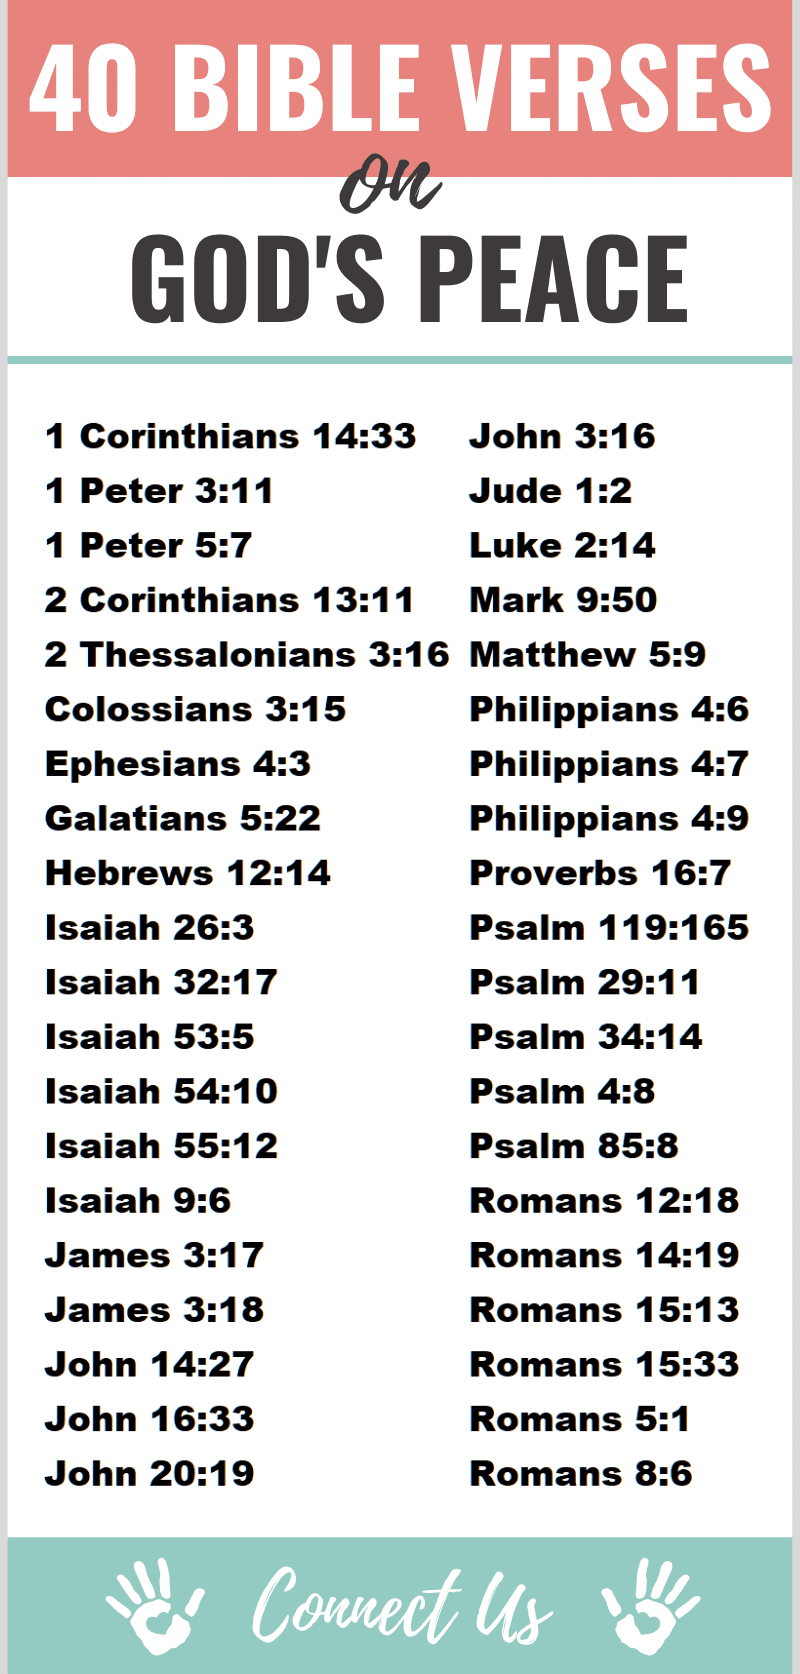 Bible Verses on God's Peace